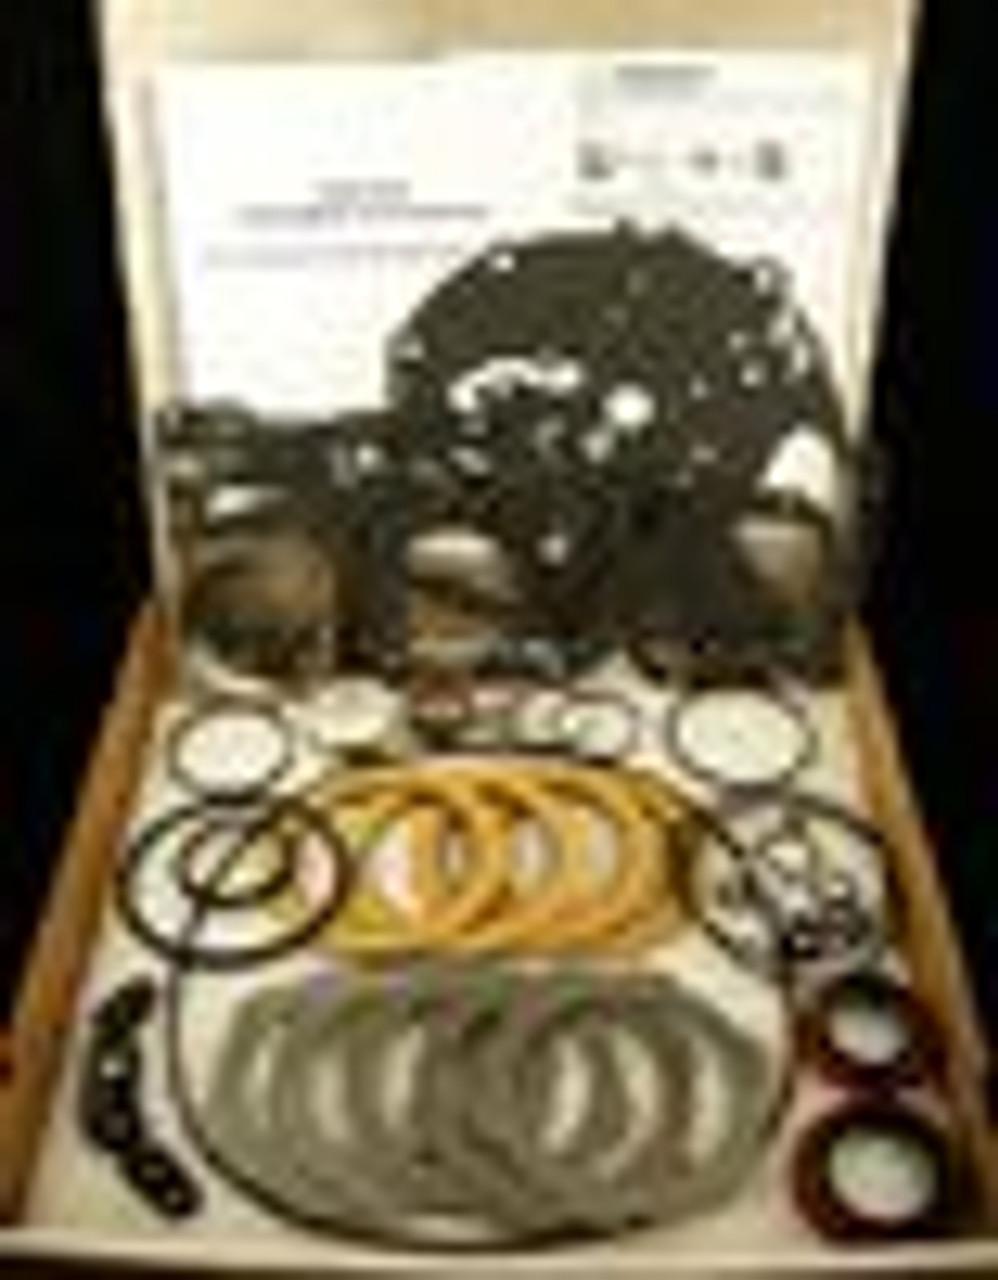 Cast Iron Powerglide Transmission Master Rebuild Parts Kit 1956 1957